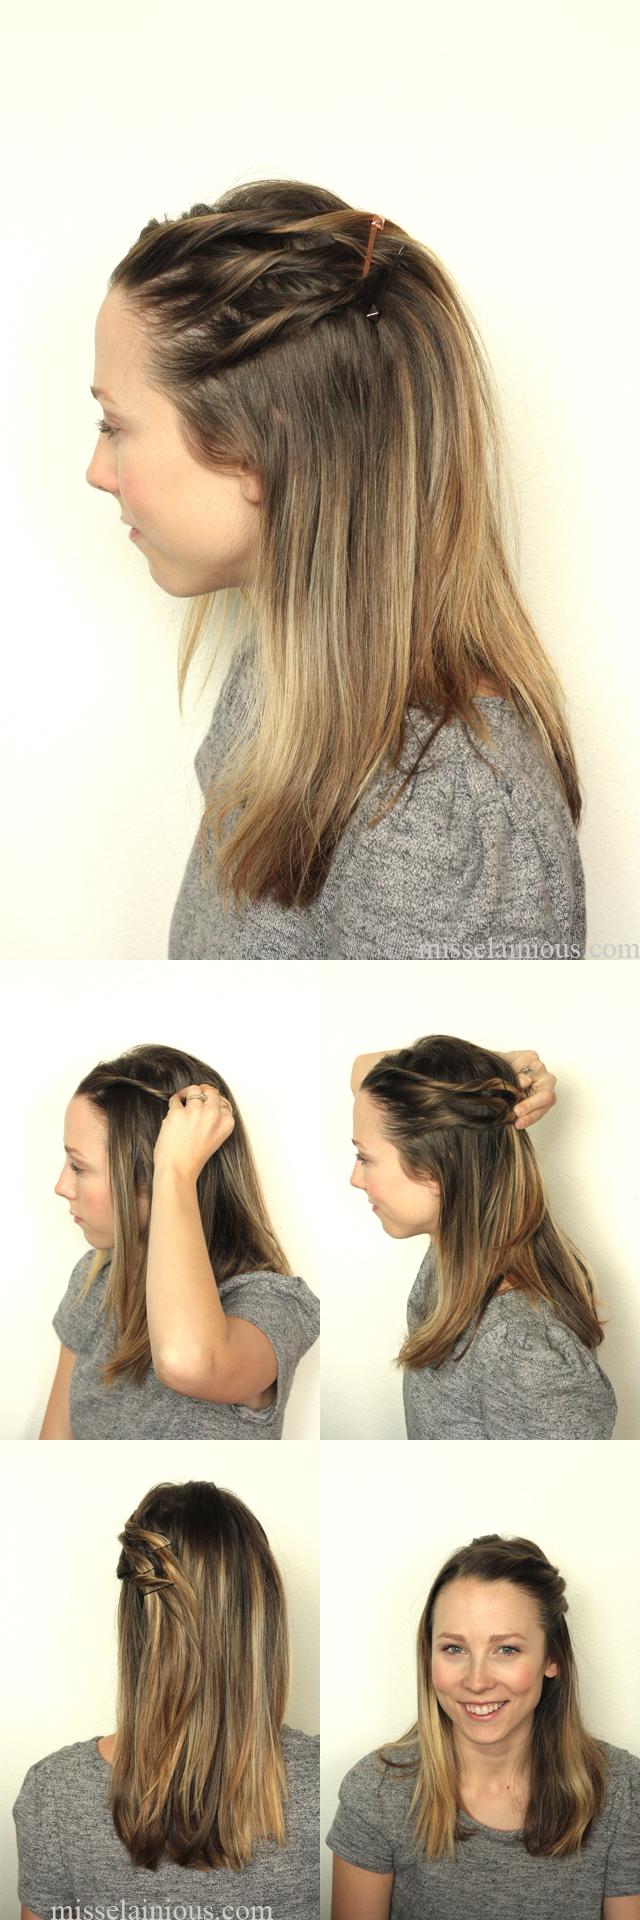 Three twist hair style | Misselainious blog